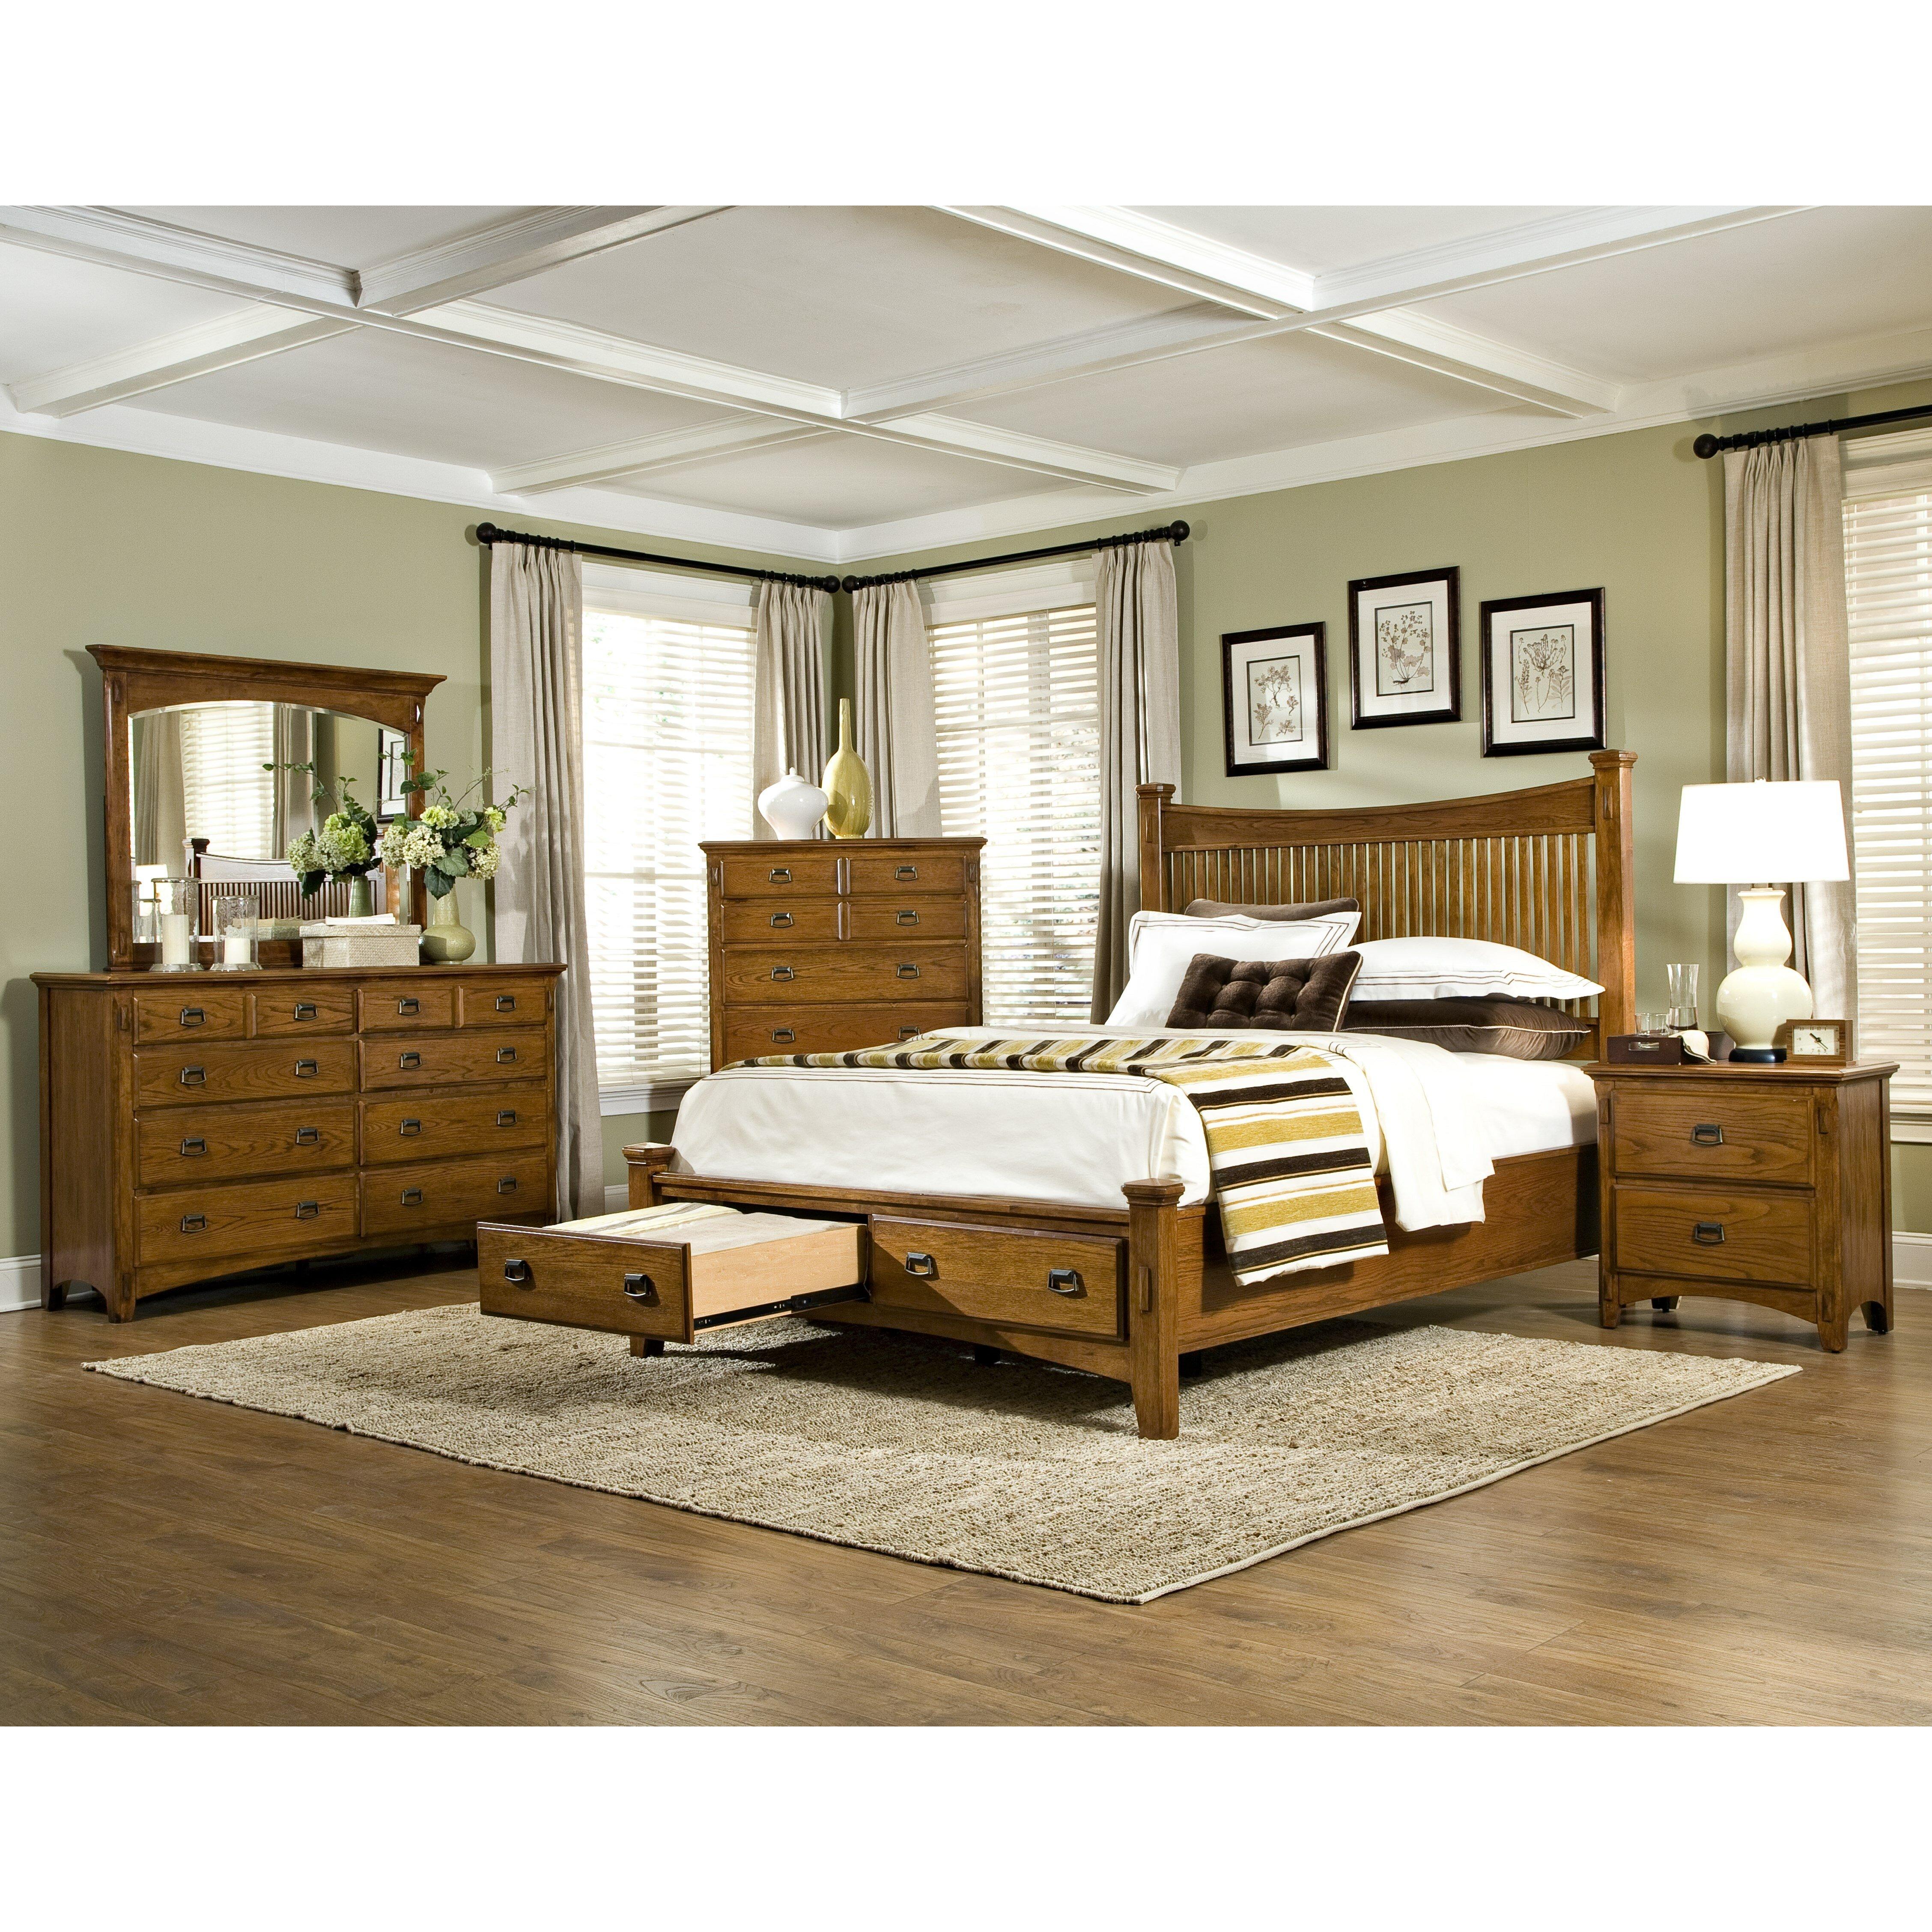 Imagio Home Pasilla Customizable Bedroom Set Reviews Wayfair